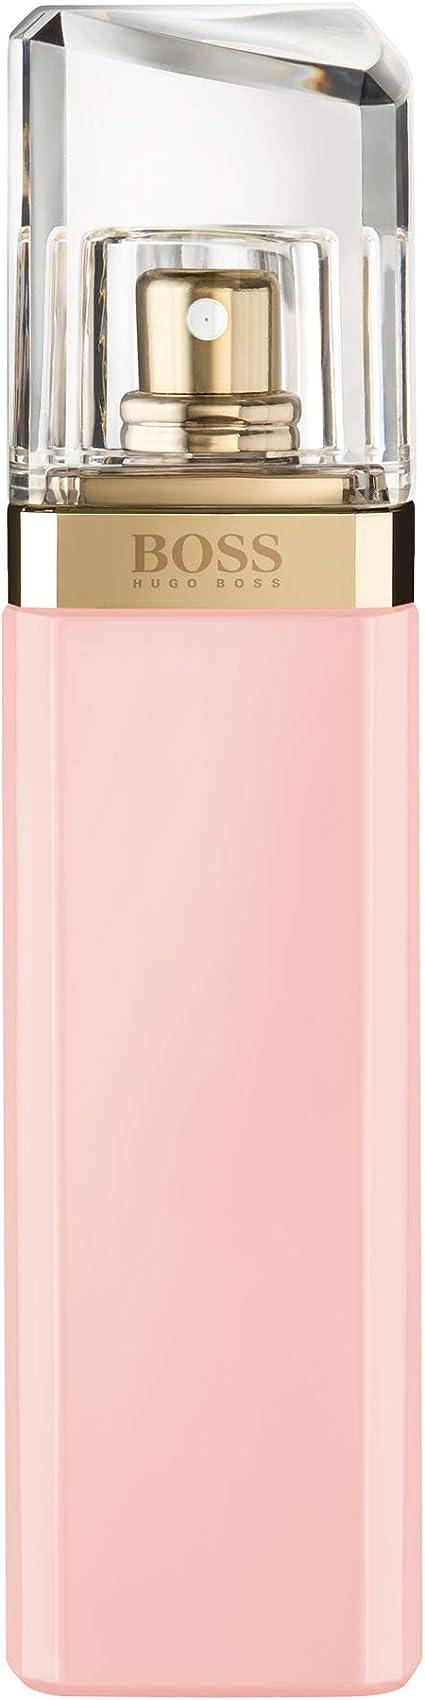 Hugo Boss Boss Ma Vie Eau De Parfum Donna 50 Ml Hugo Boss Amazon It